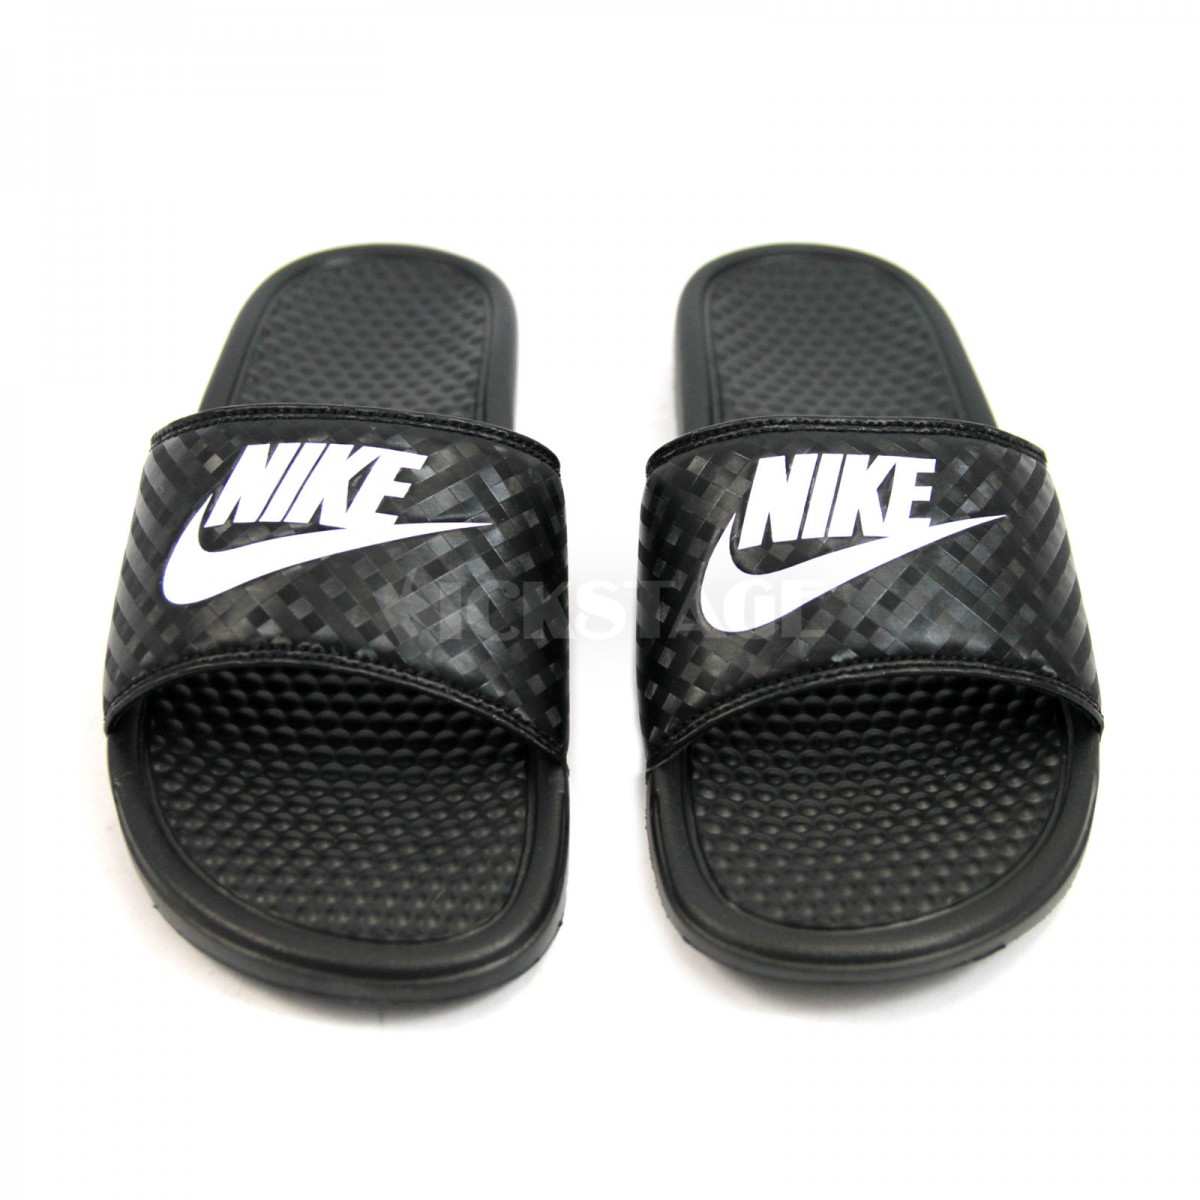 40a79e43daf ... Nike WMNS Benassi JDI Chanclas Mujer 343881 011 Negras ...